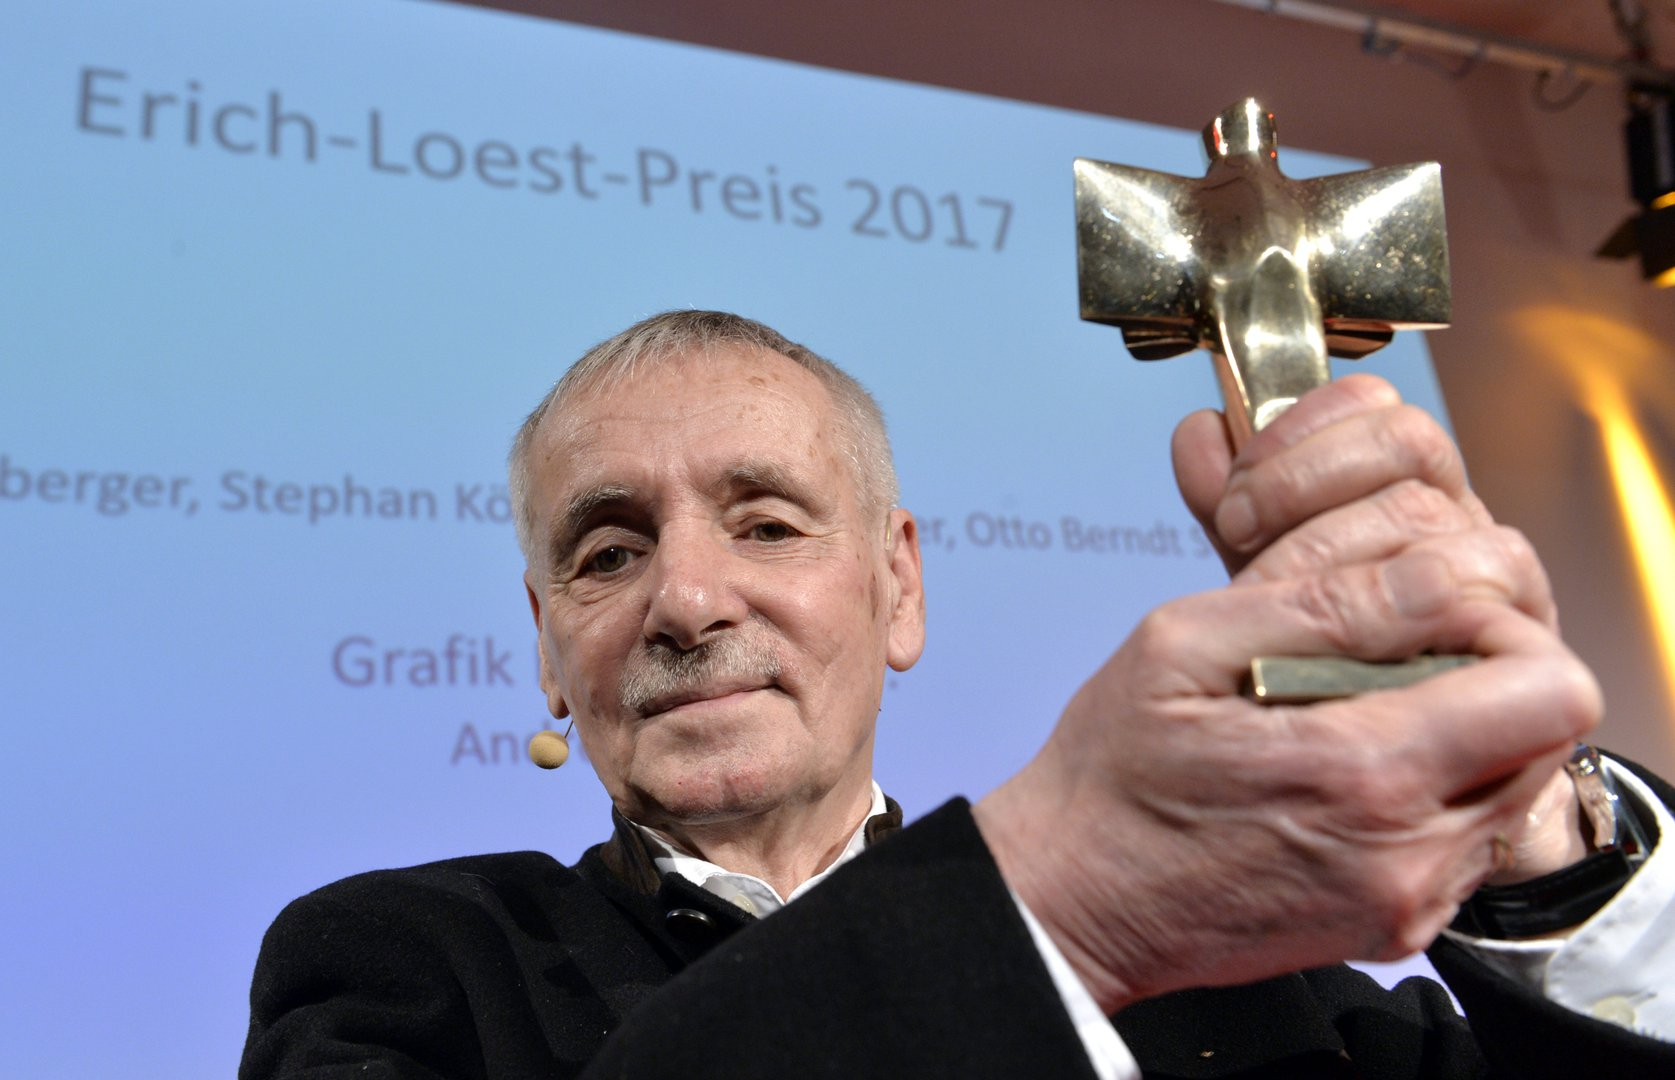 Guntram Vesper with the Erich-Loest-Award